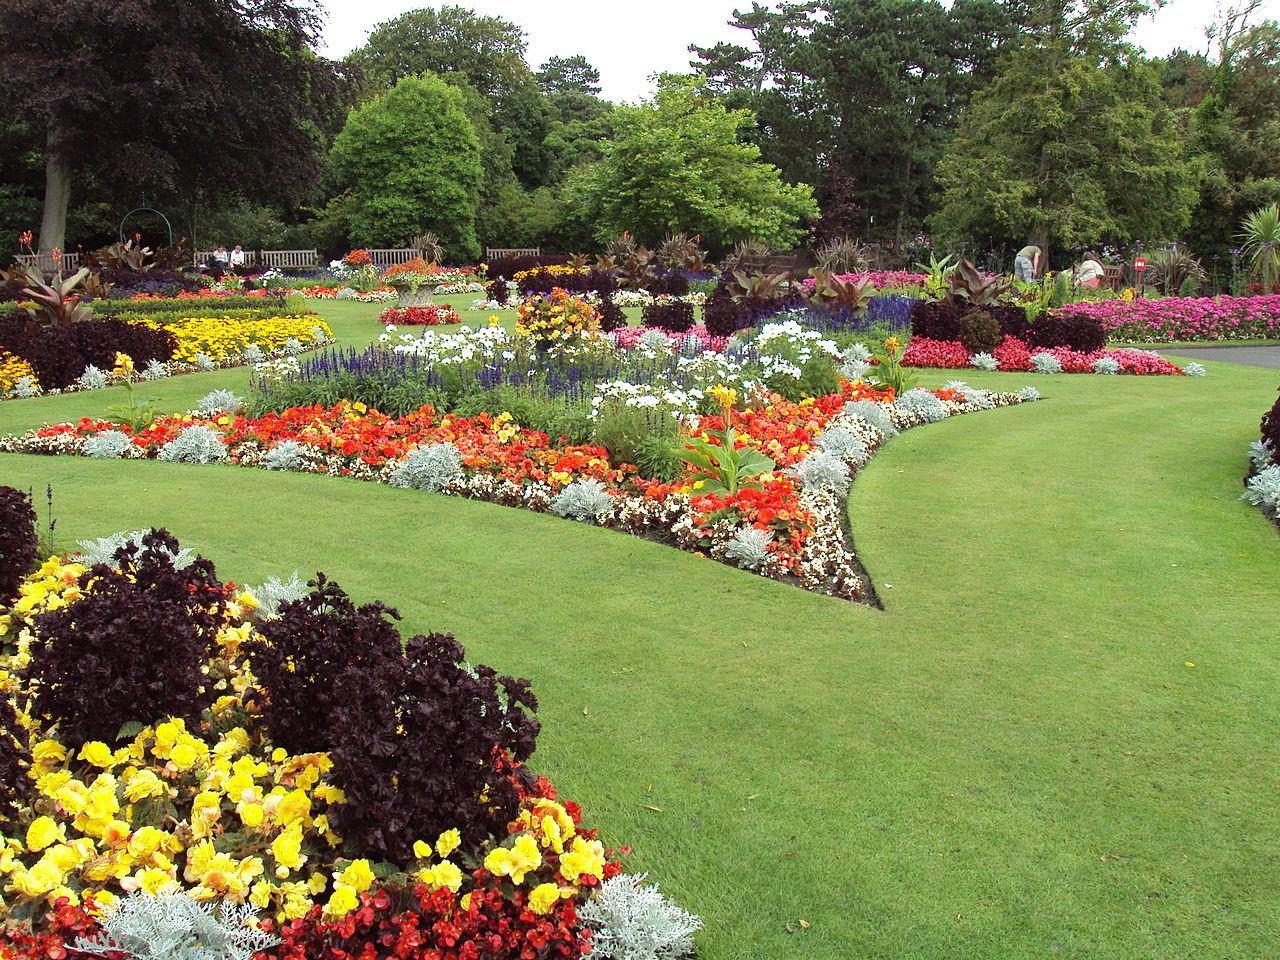 Modern garden still influence by Victorian style Photo by: Rept0n1x